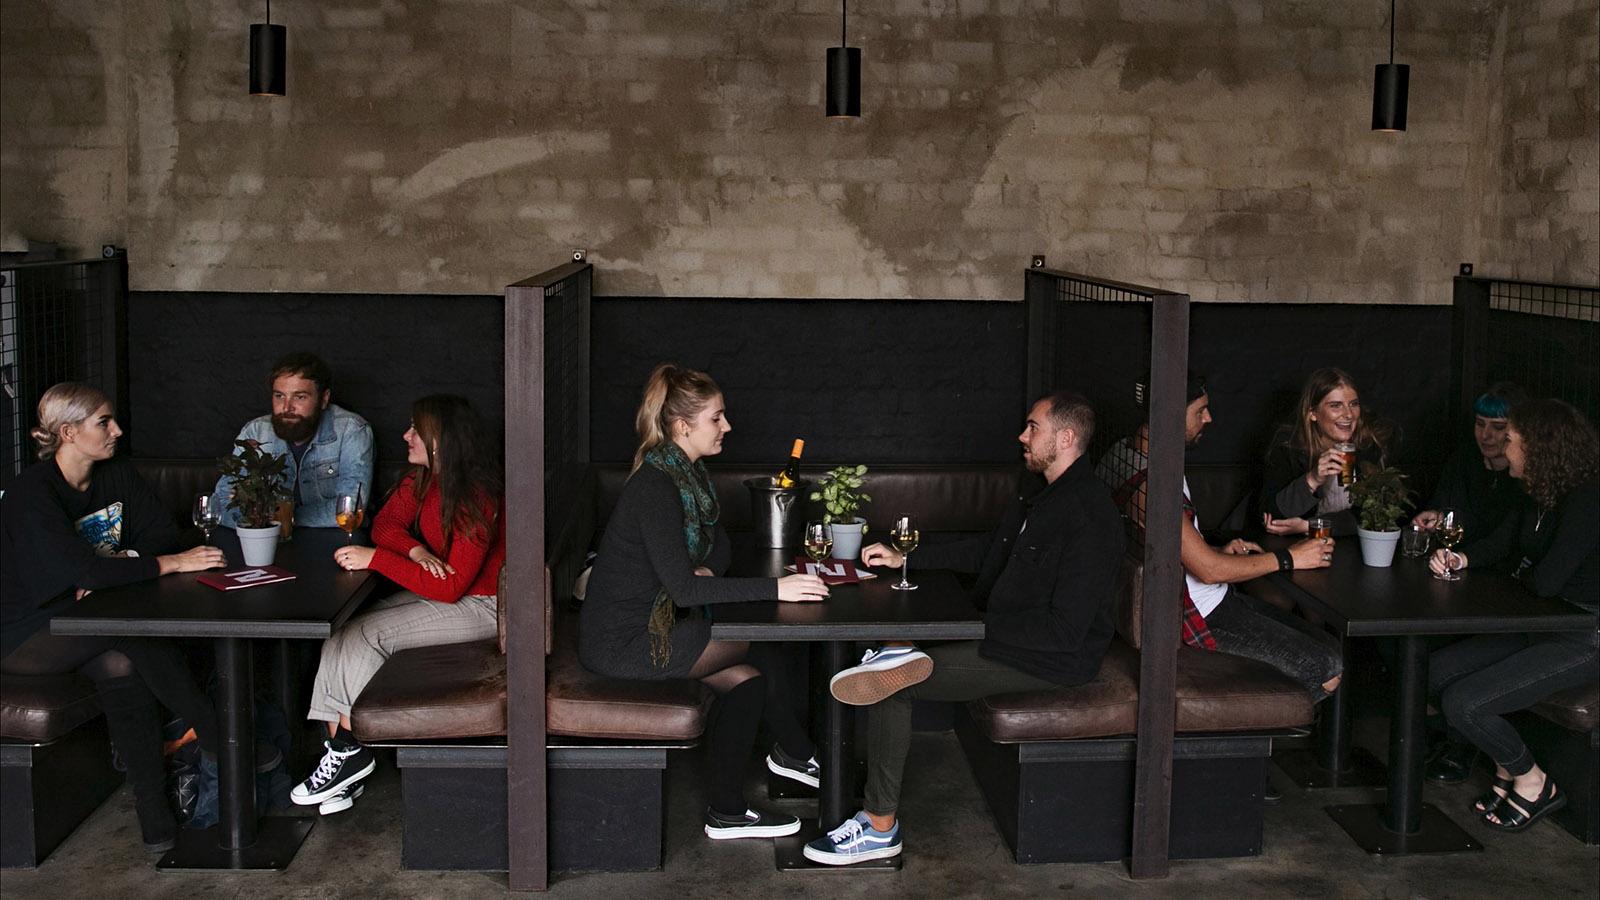 Northcote Social Club, Melbourne, Victoria, Australia